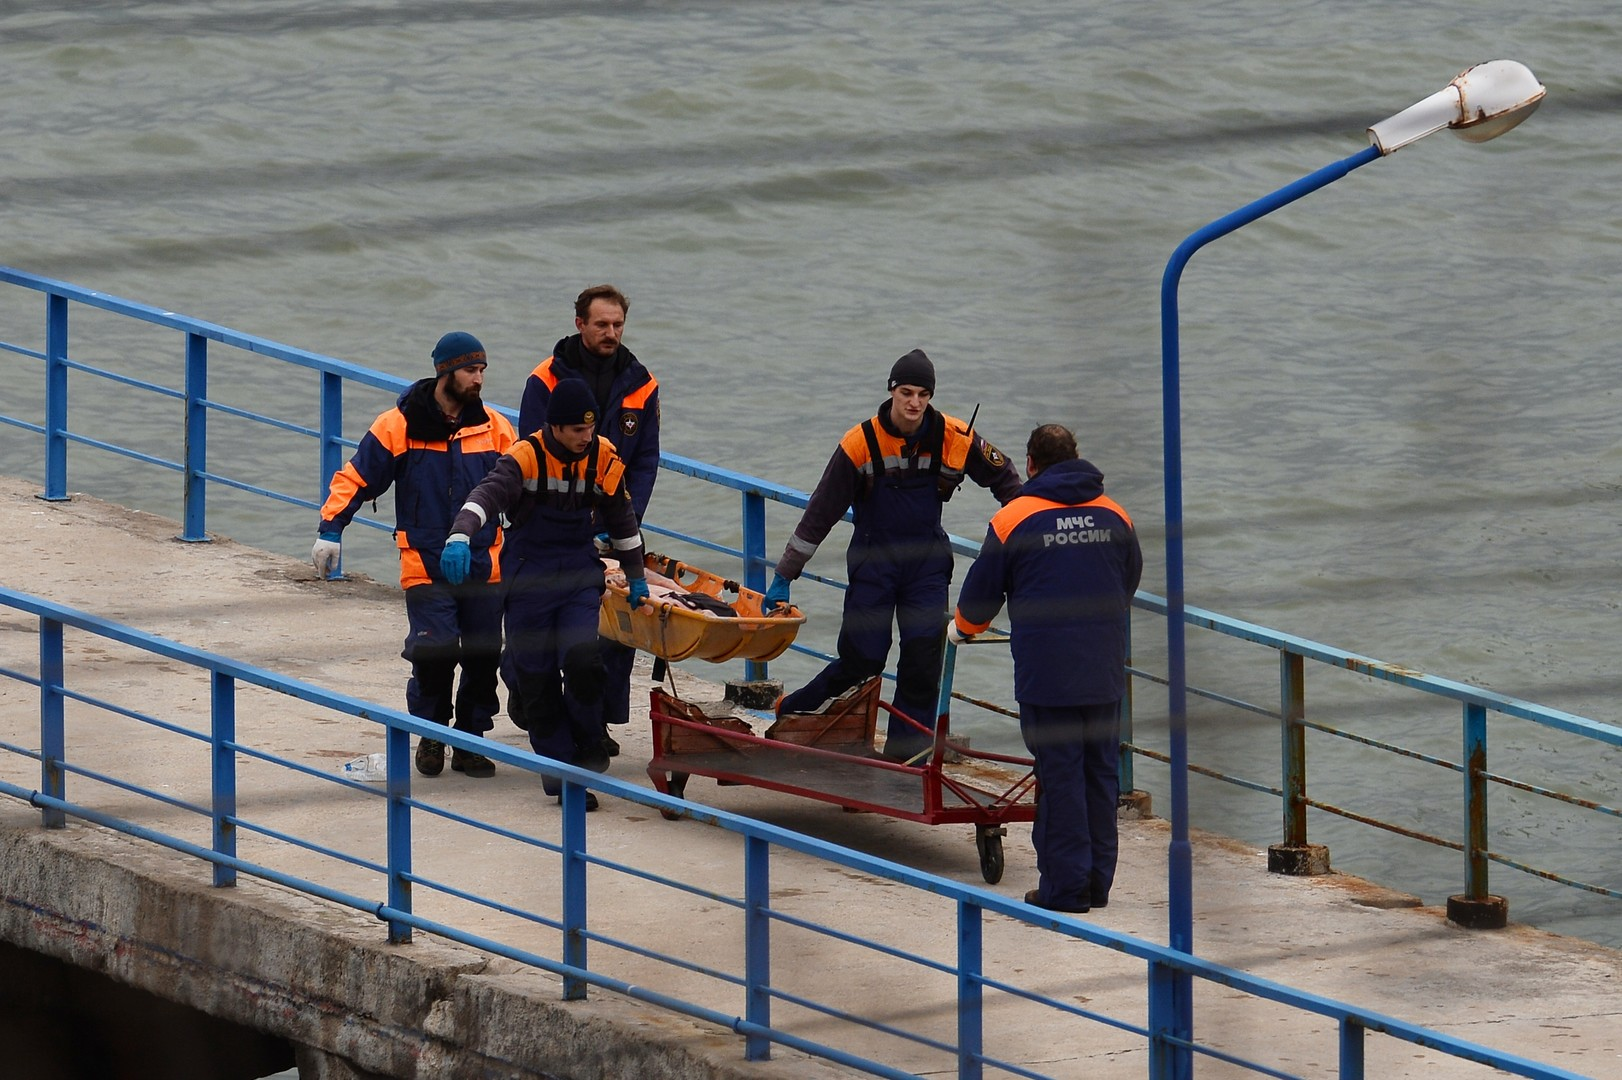 Russische Passagiermaschine stürzt mit 92 Menschen an Bord ins Meer ab